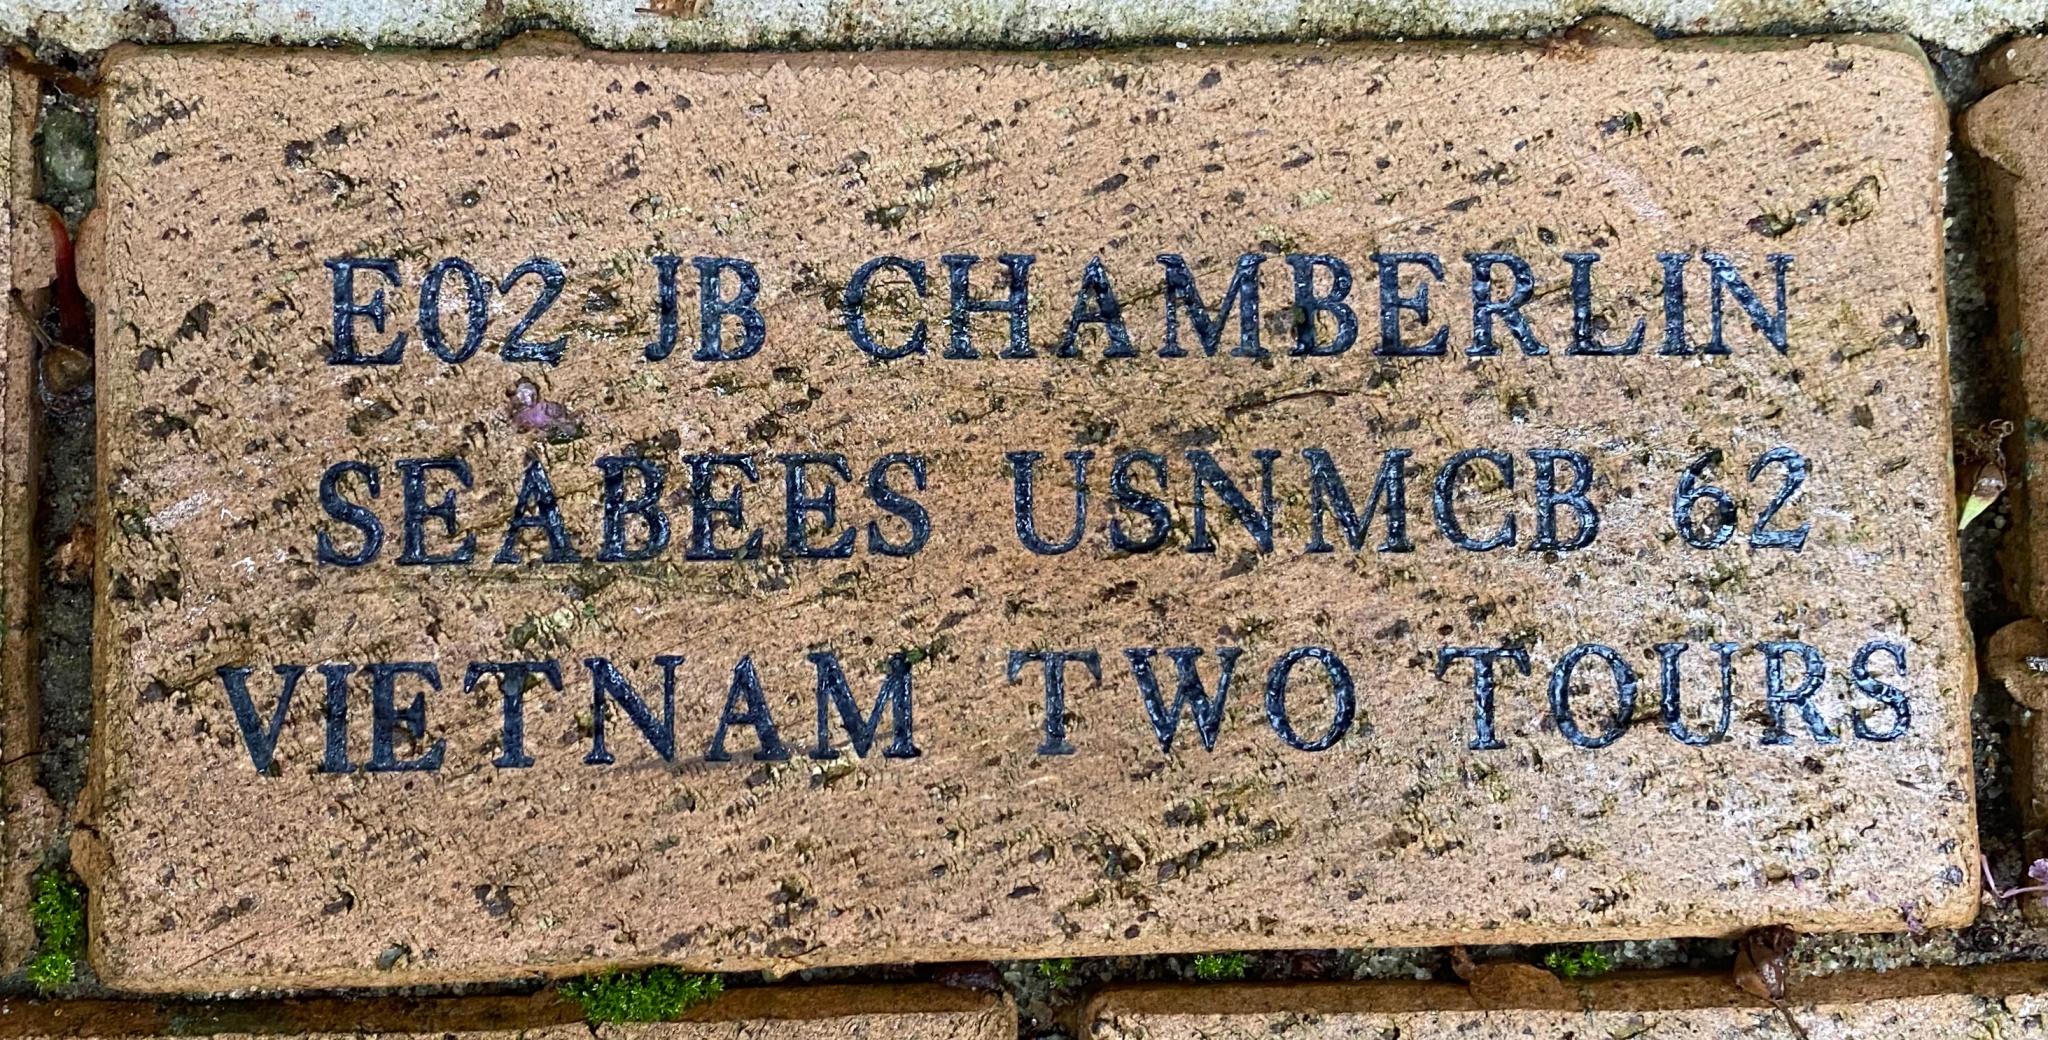 E02 JB CHAMBERLIN SEABEES USNMCB 62 VIETNAM TWO TOURS